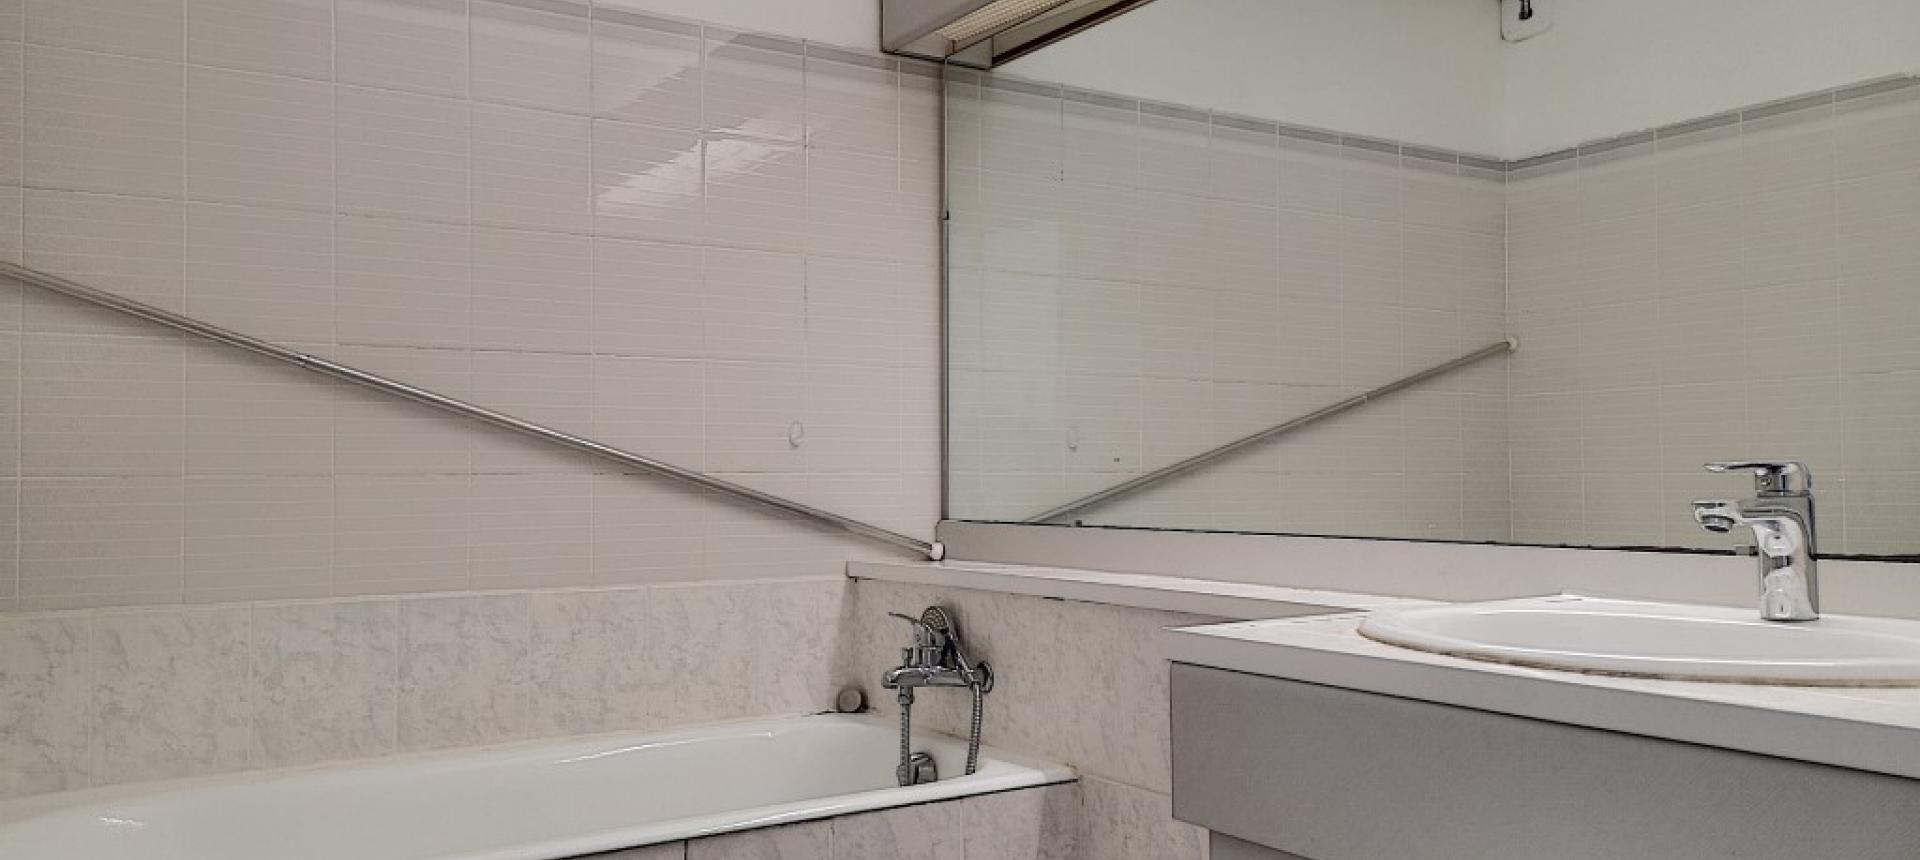 F1 à louer rue de Wagram salle de bain